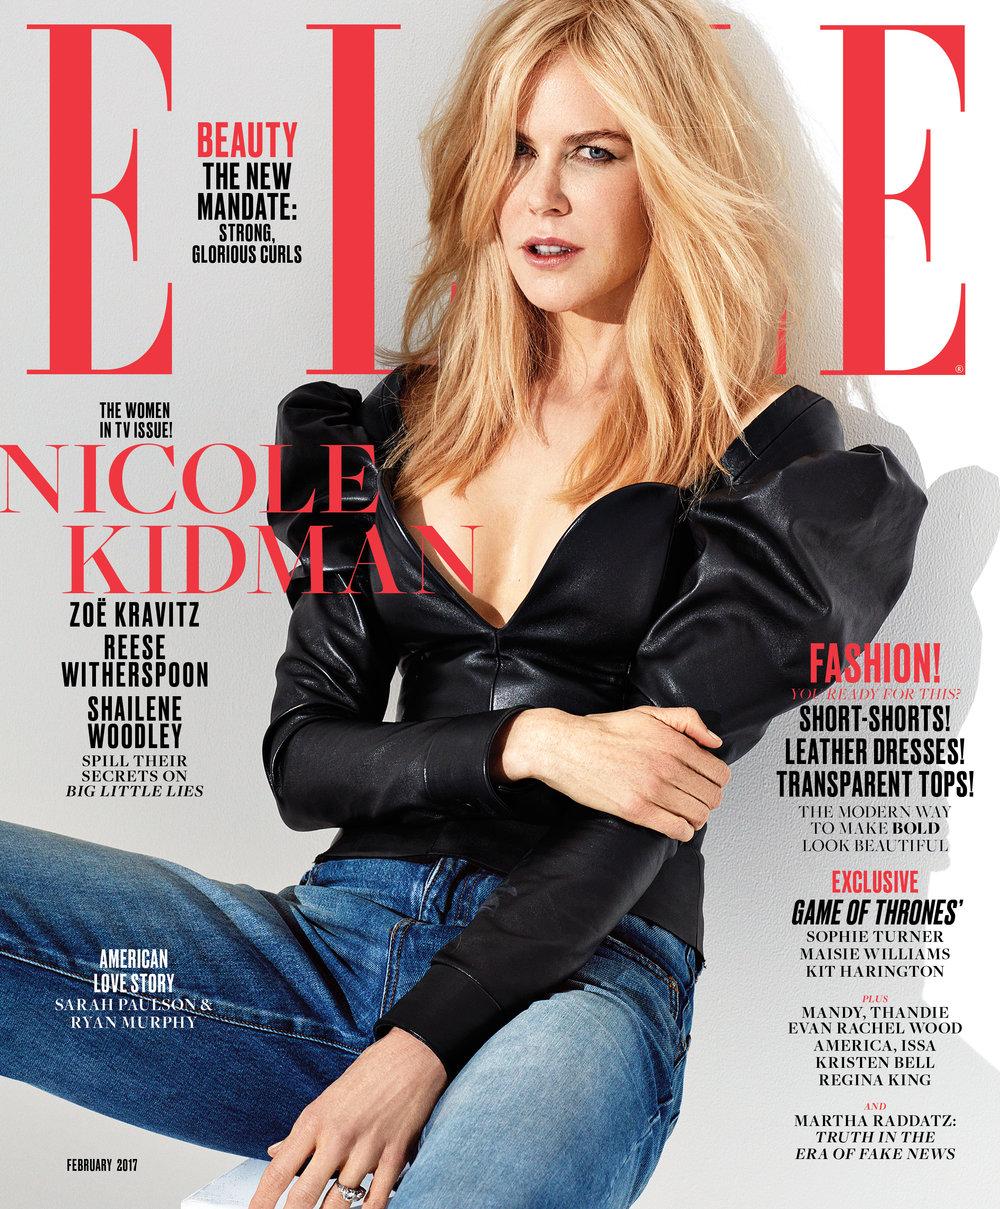 FEB-ELLE-Covers-Nicole-Kidman.jpeg